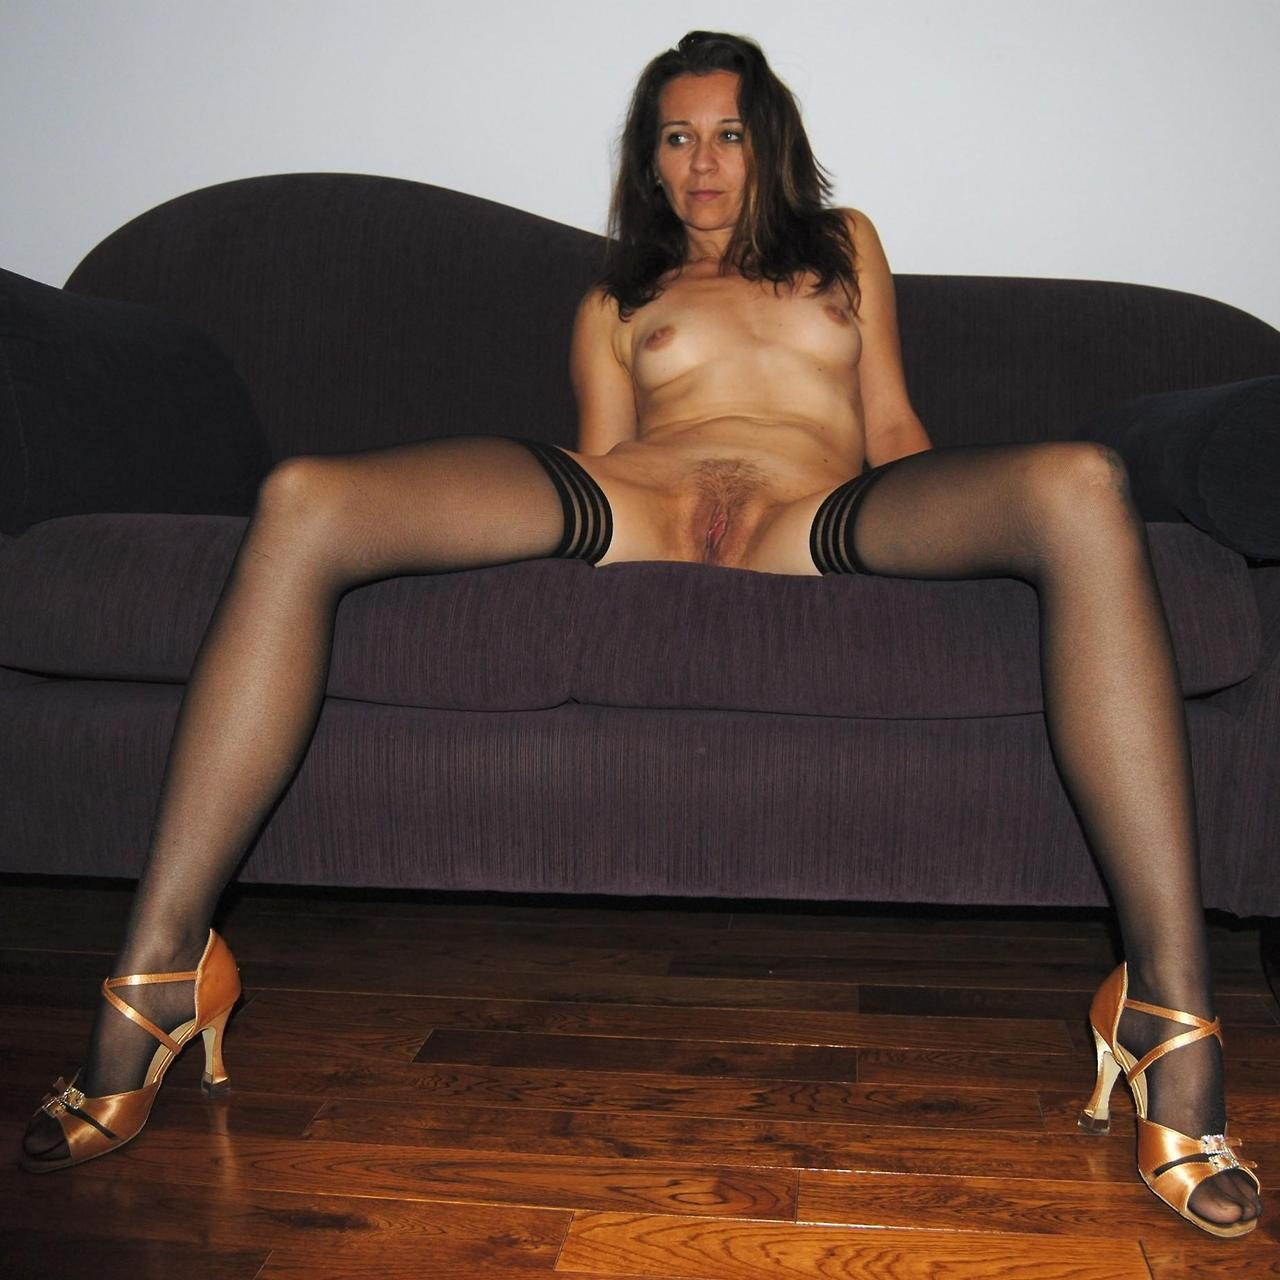 pinay porn movies sex lingerie sex videos